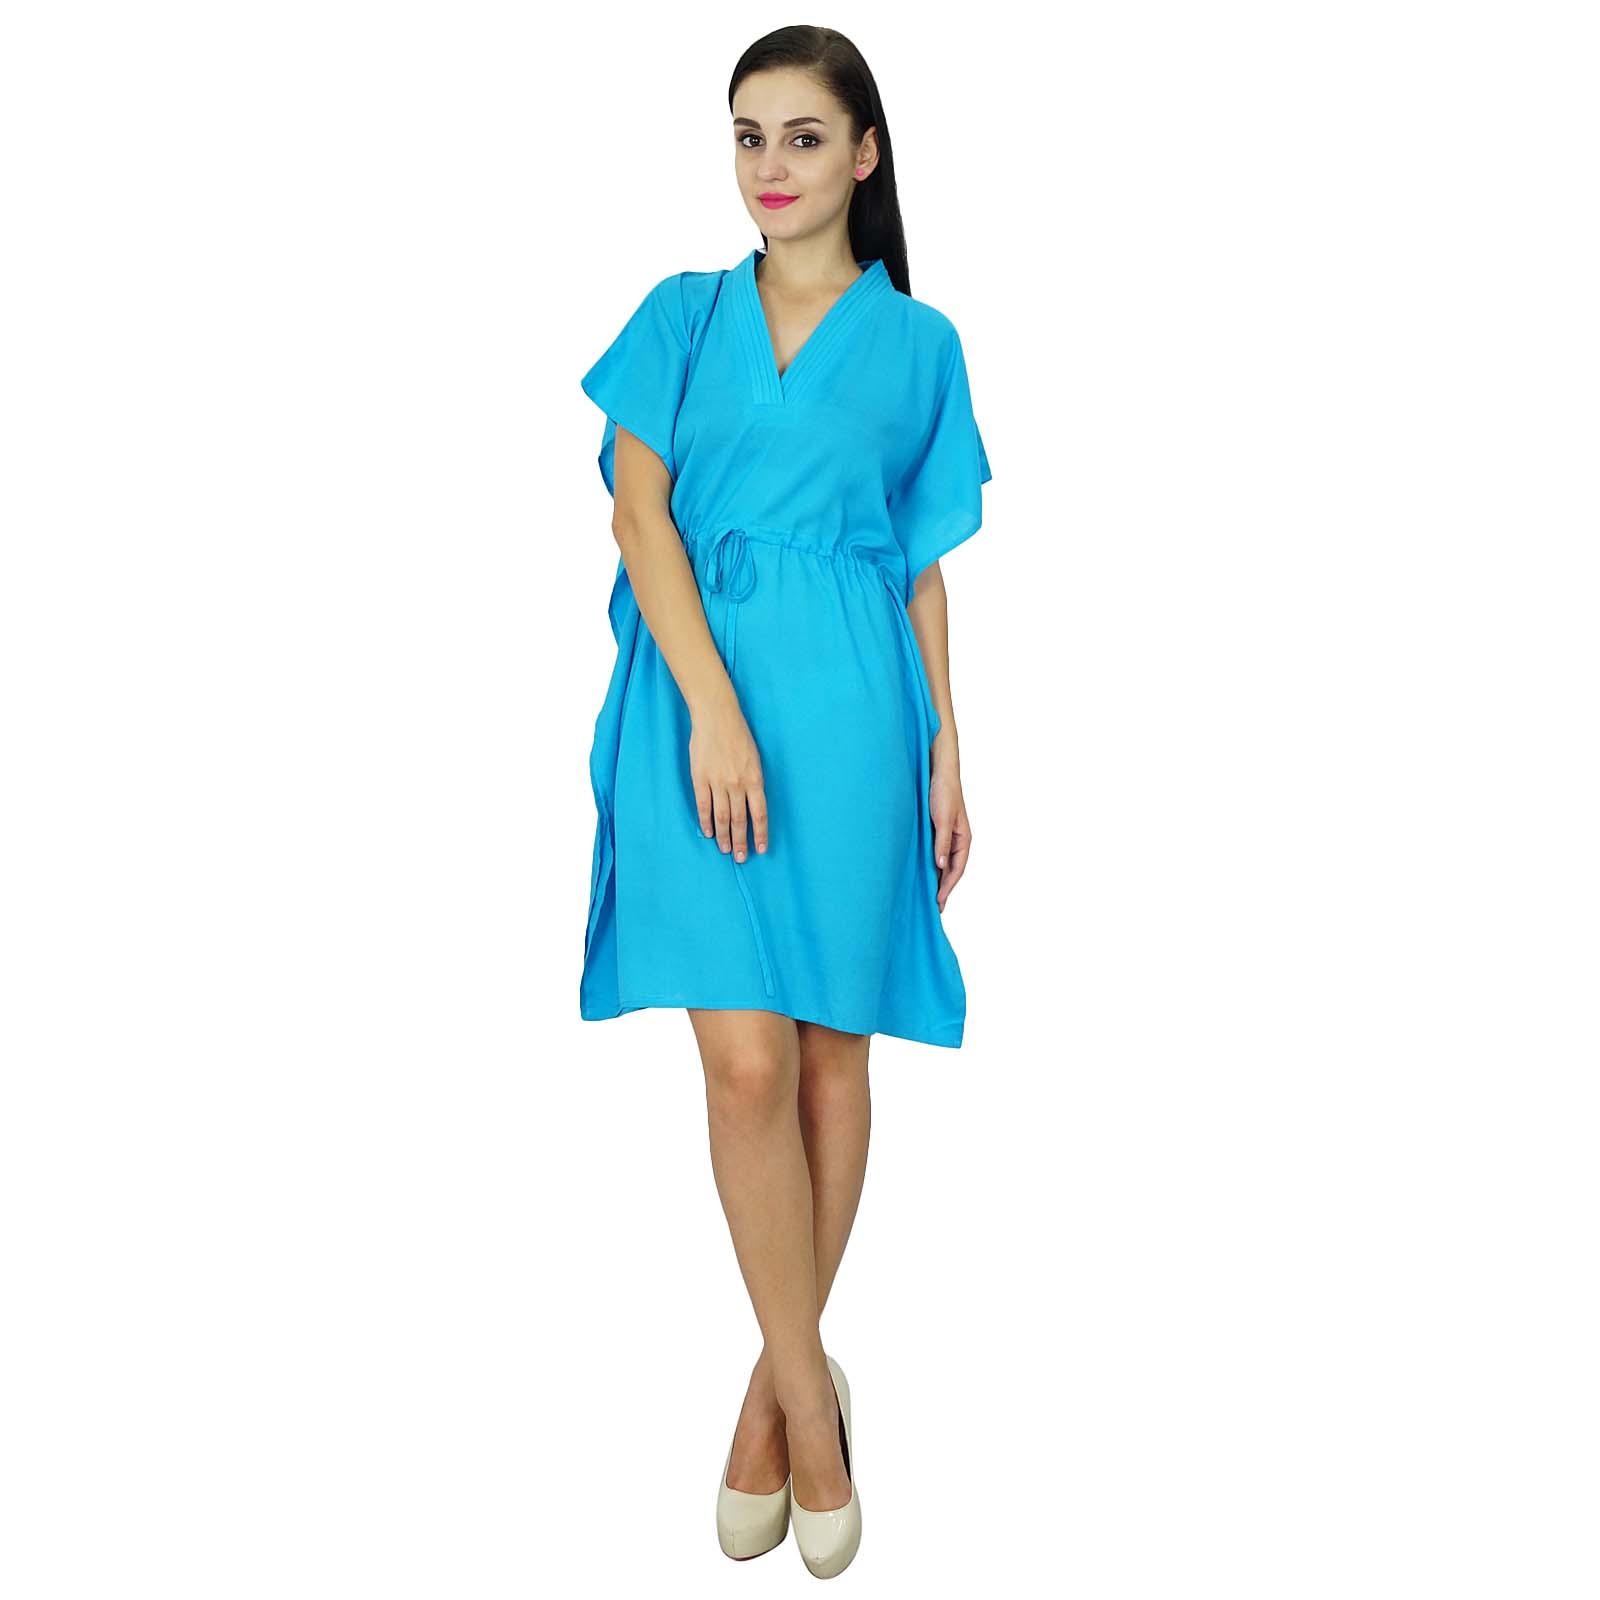 thumbnail 3 - Bimba Women Plain Kaftan Dress Beach Cover Up Cotton Solid Caftan-58z